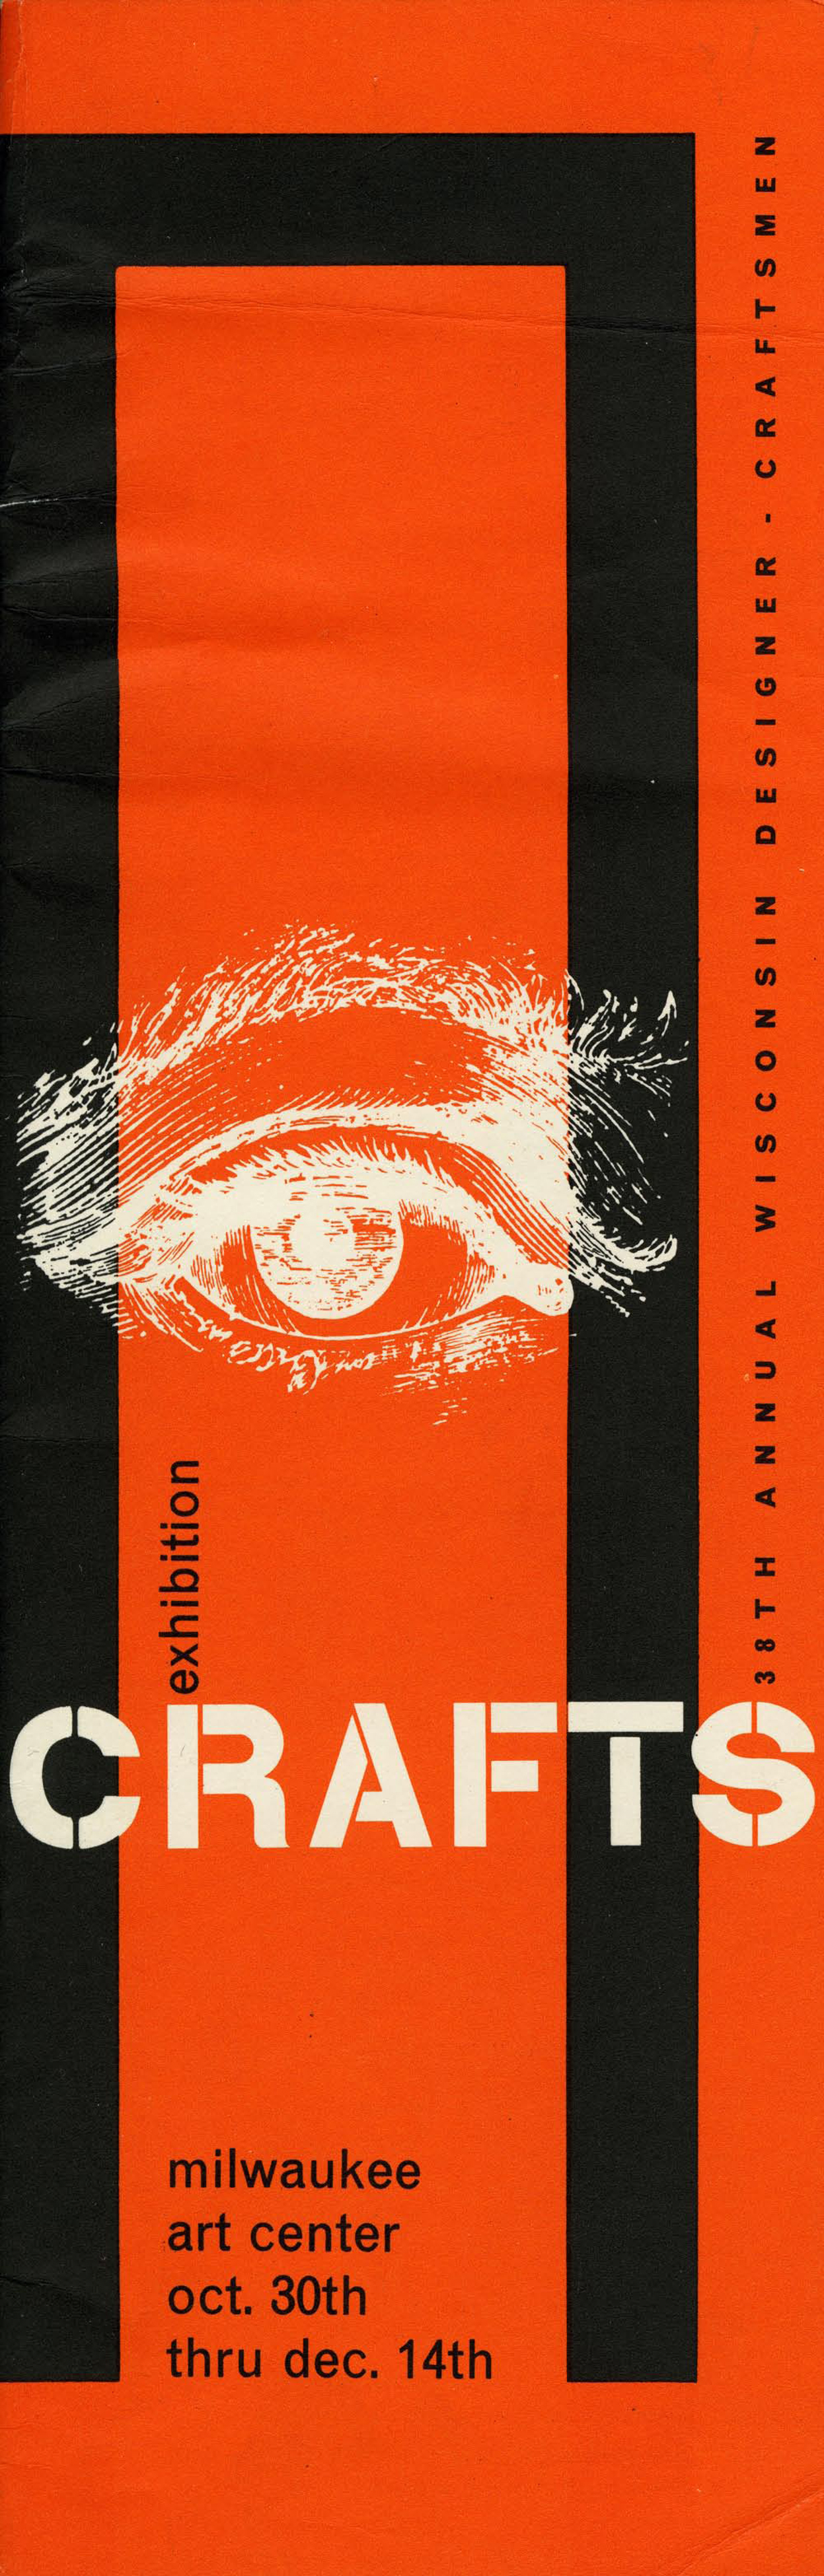 John J. Reiss, exhibition catalogue, 38th Wisconsin Designer Craftsman Exhibition, 1958